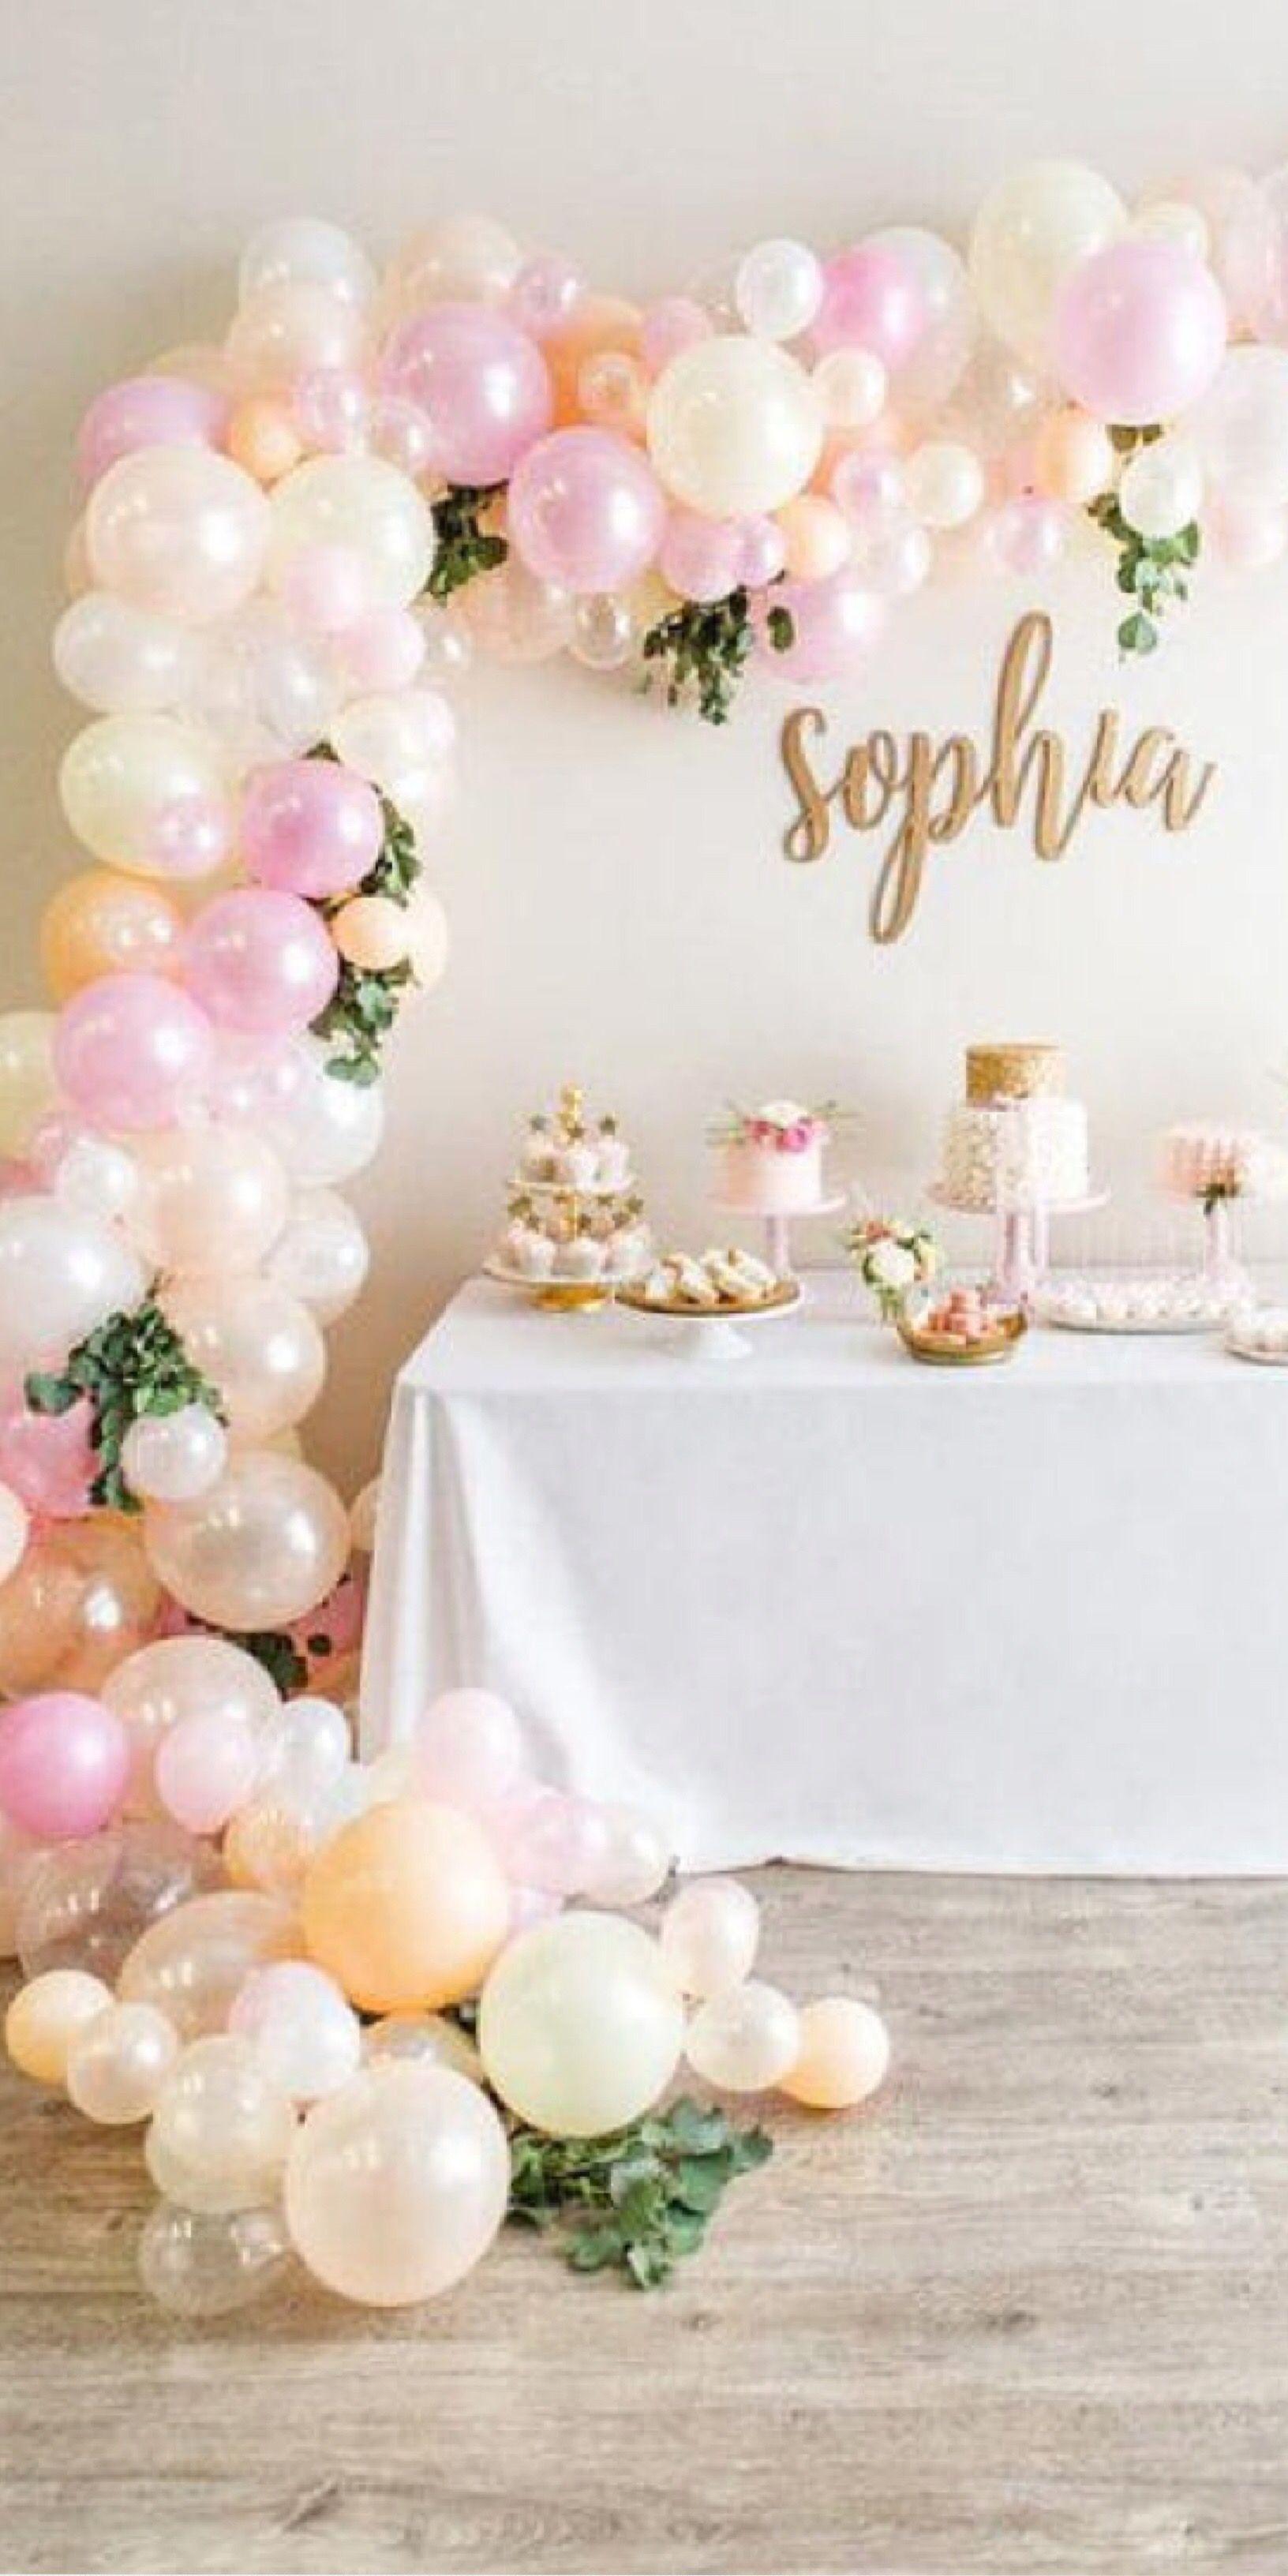 DIY Balloon Arch Kit 14/' Baby Shower Bridal Shower Birthday Party Decoration Balloon Decoration